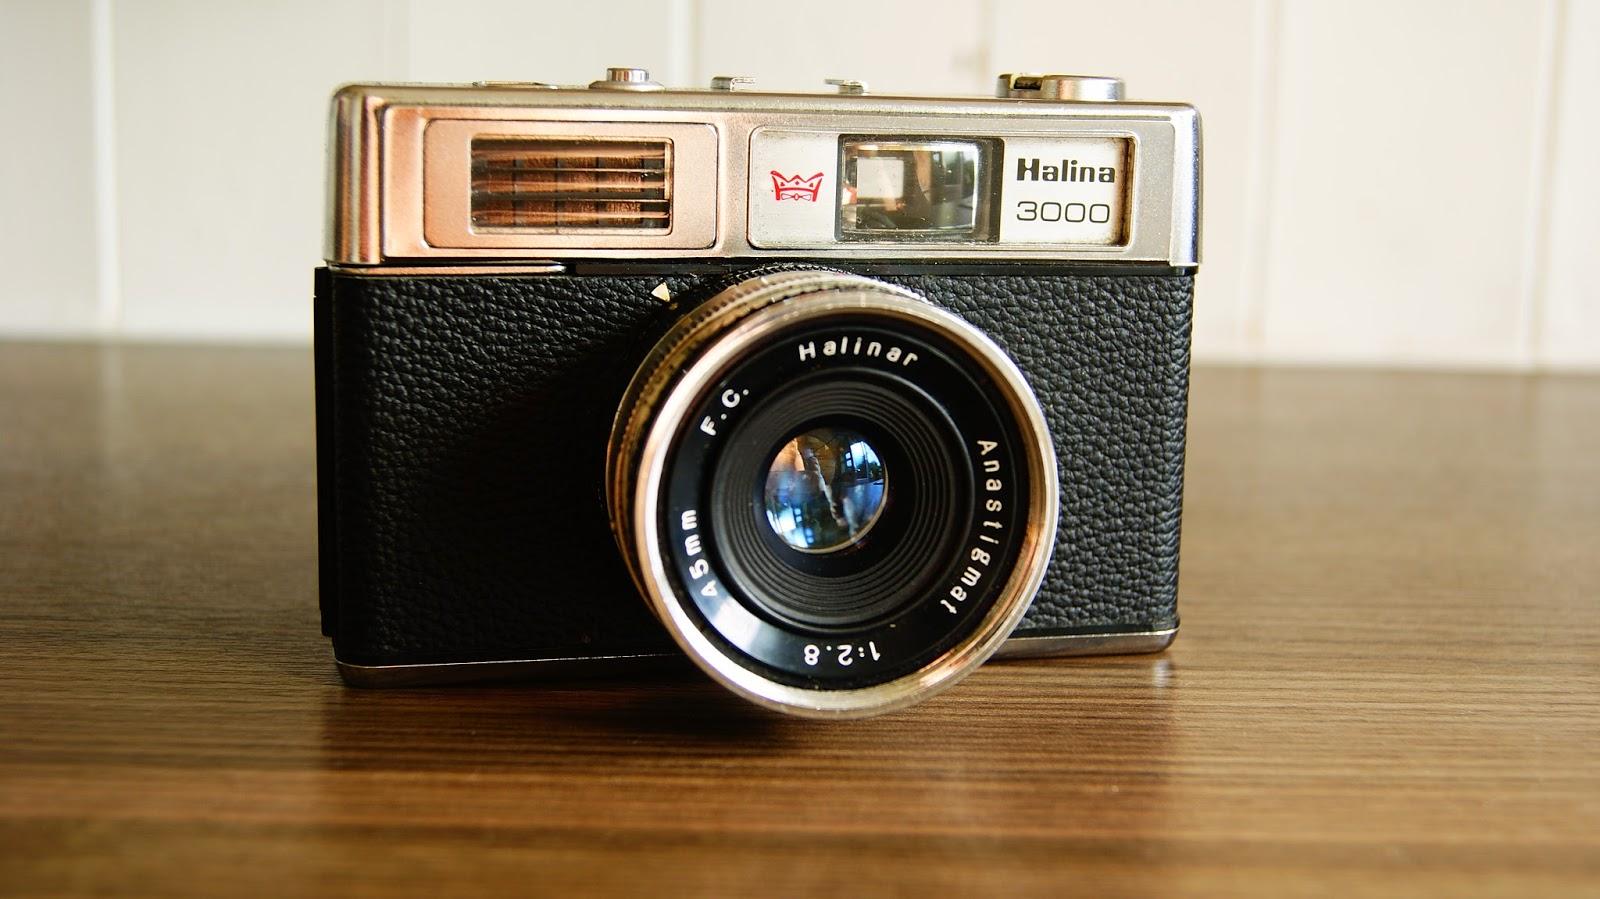 Vintage Camera I haven't used a camera like